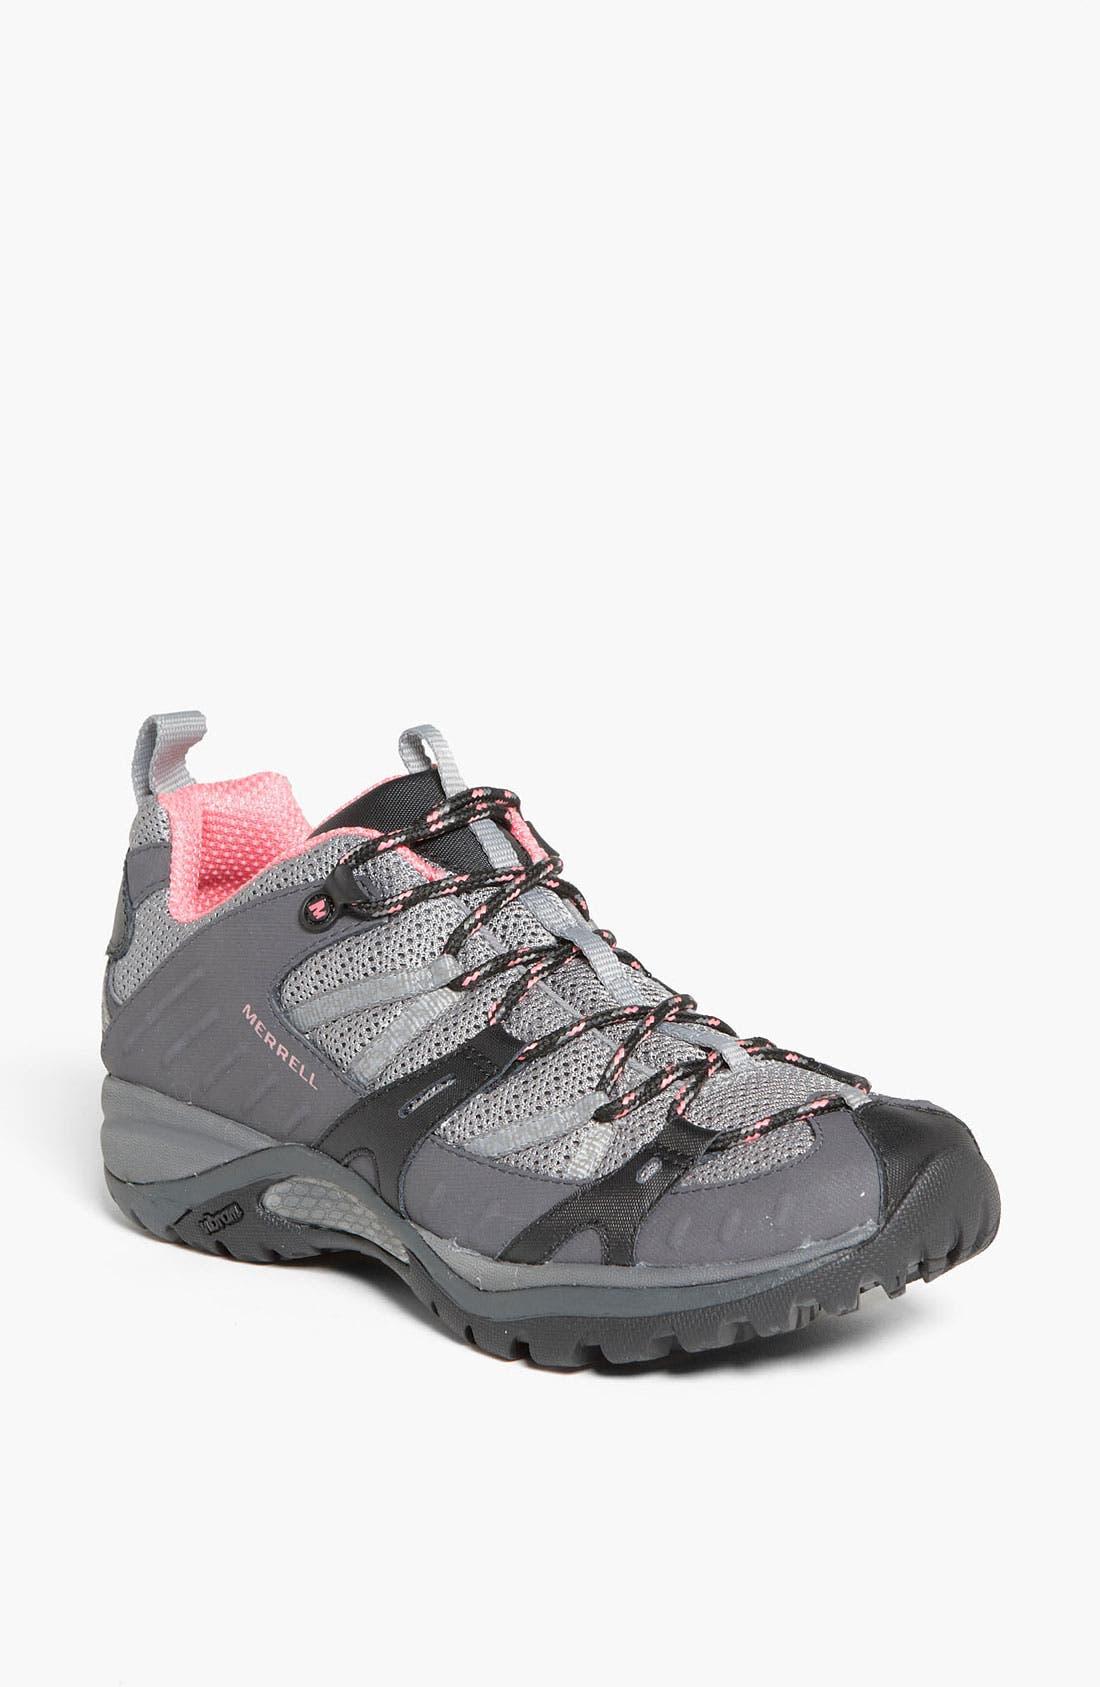 Main Image - Merrell 'Siren Sport 2' Walking Shoe (Women)